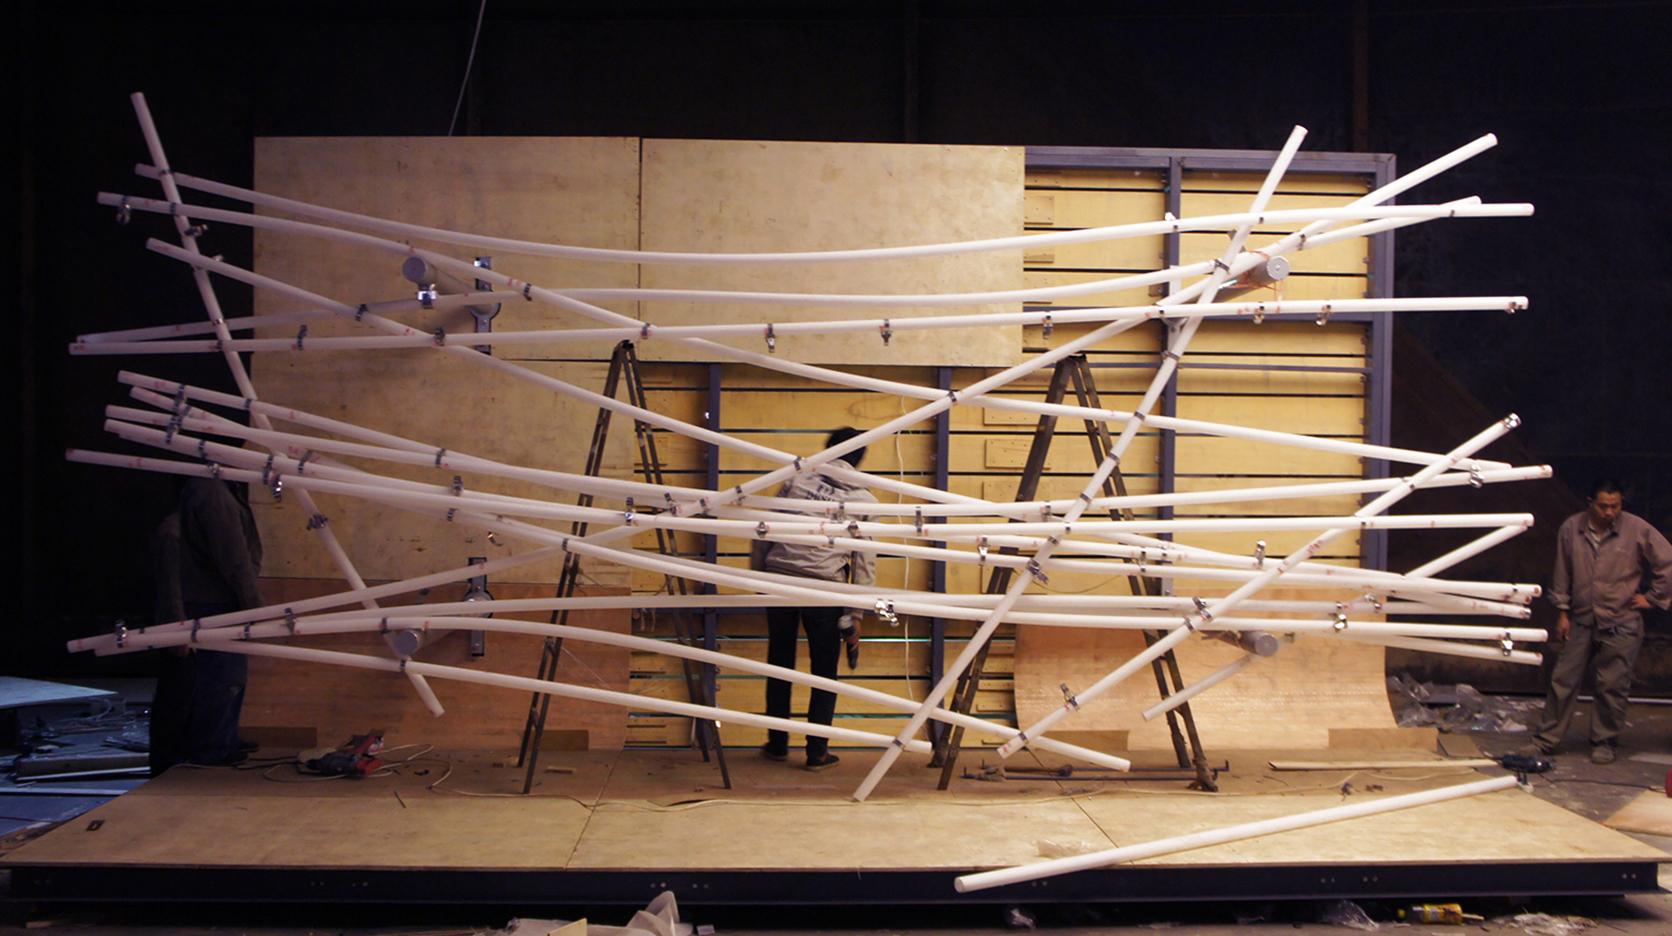 Dada Architectural Design And Installation Exhibition